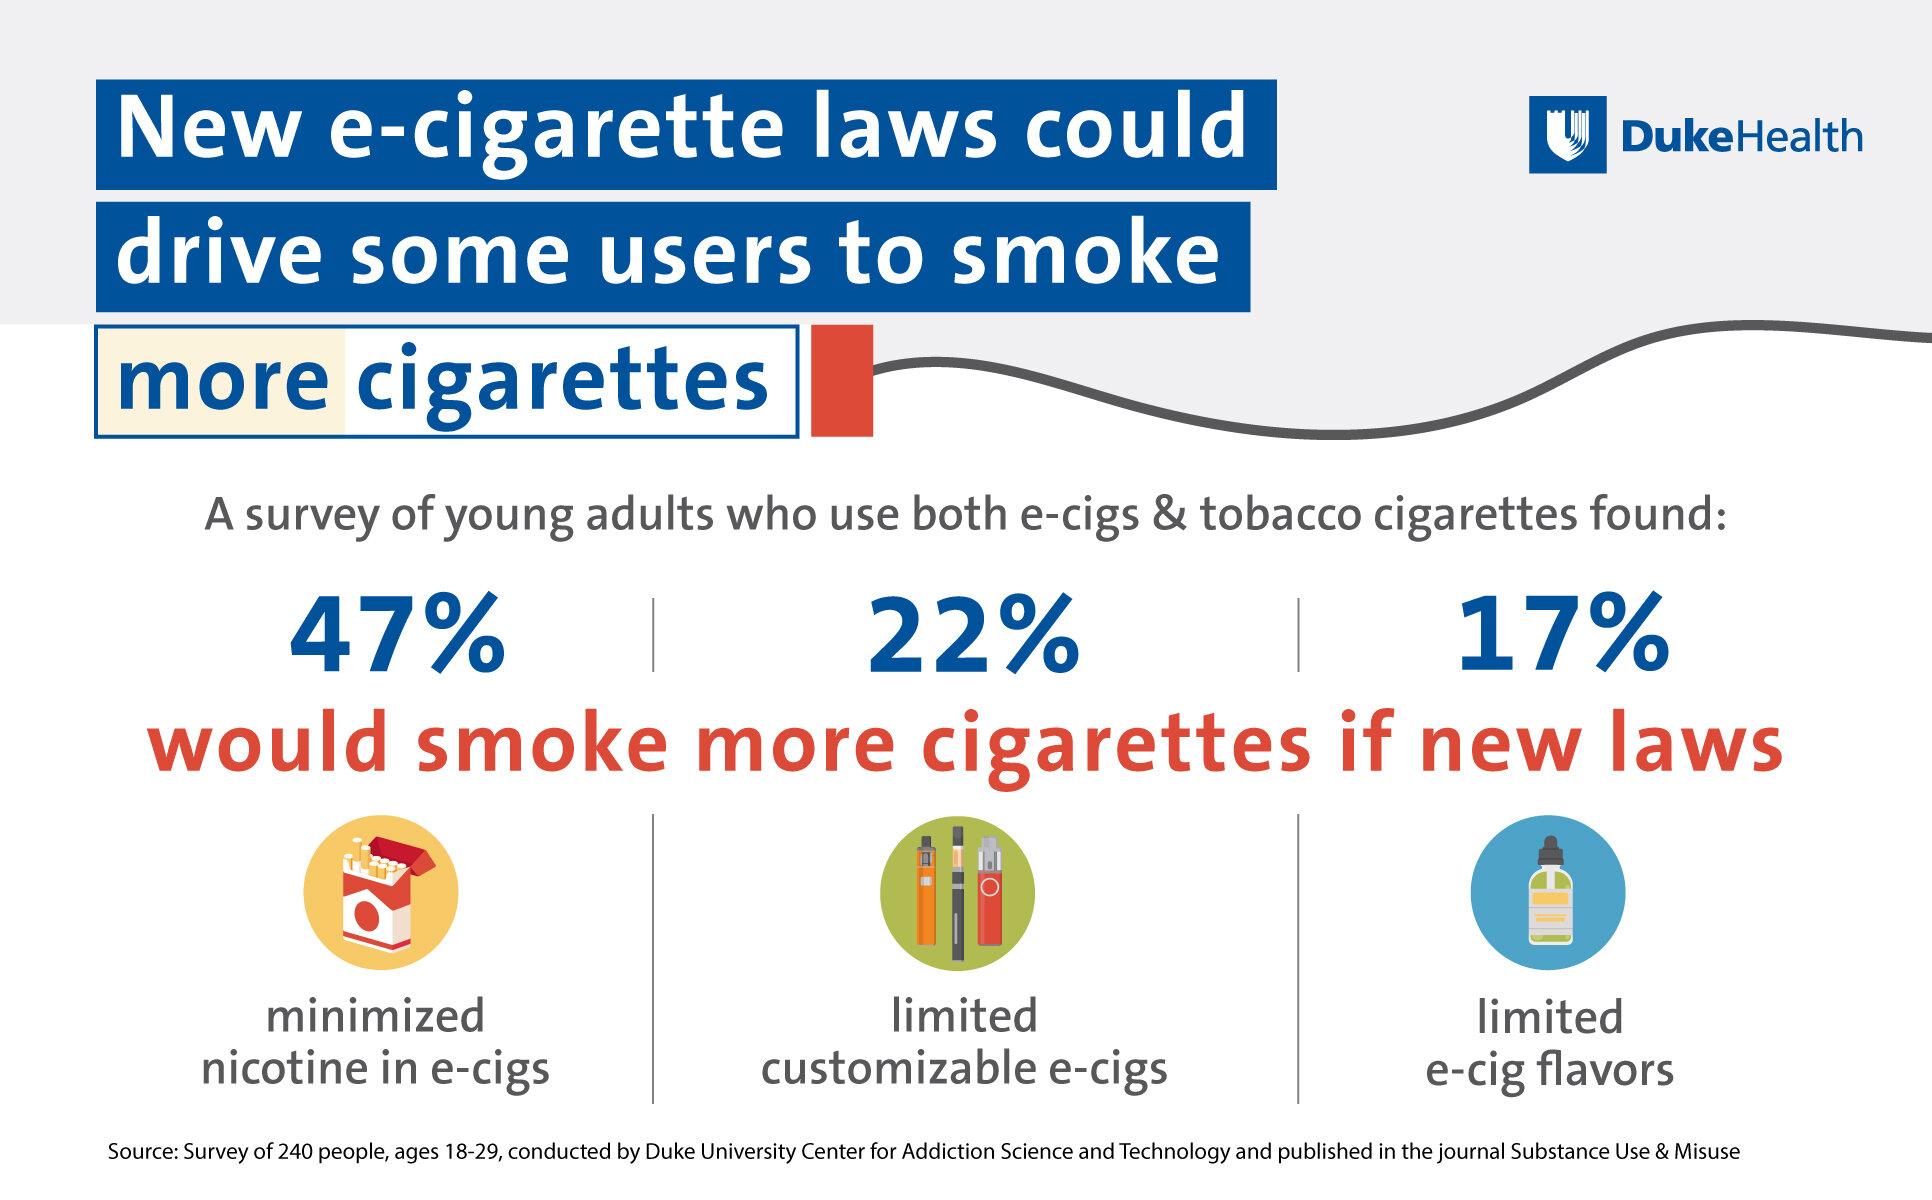 df43ad03c0a8 New e-cigarette laws could drive some users to smoke more cigarettes